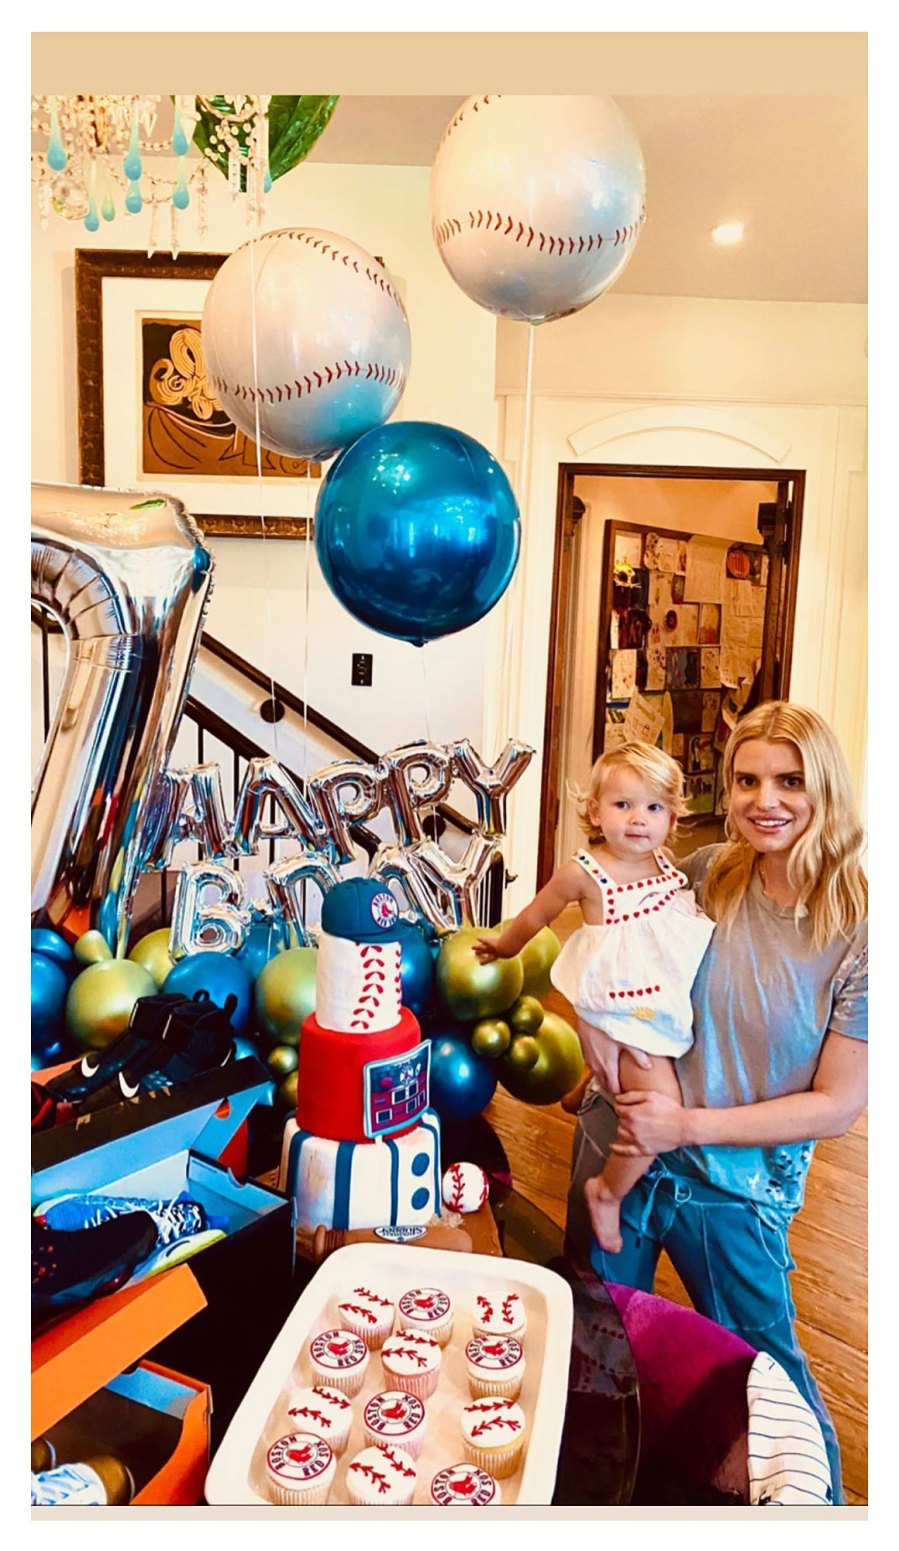 Jessica Simpson Celebrates Son Ace 7th Birthday With Baseball Theme